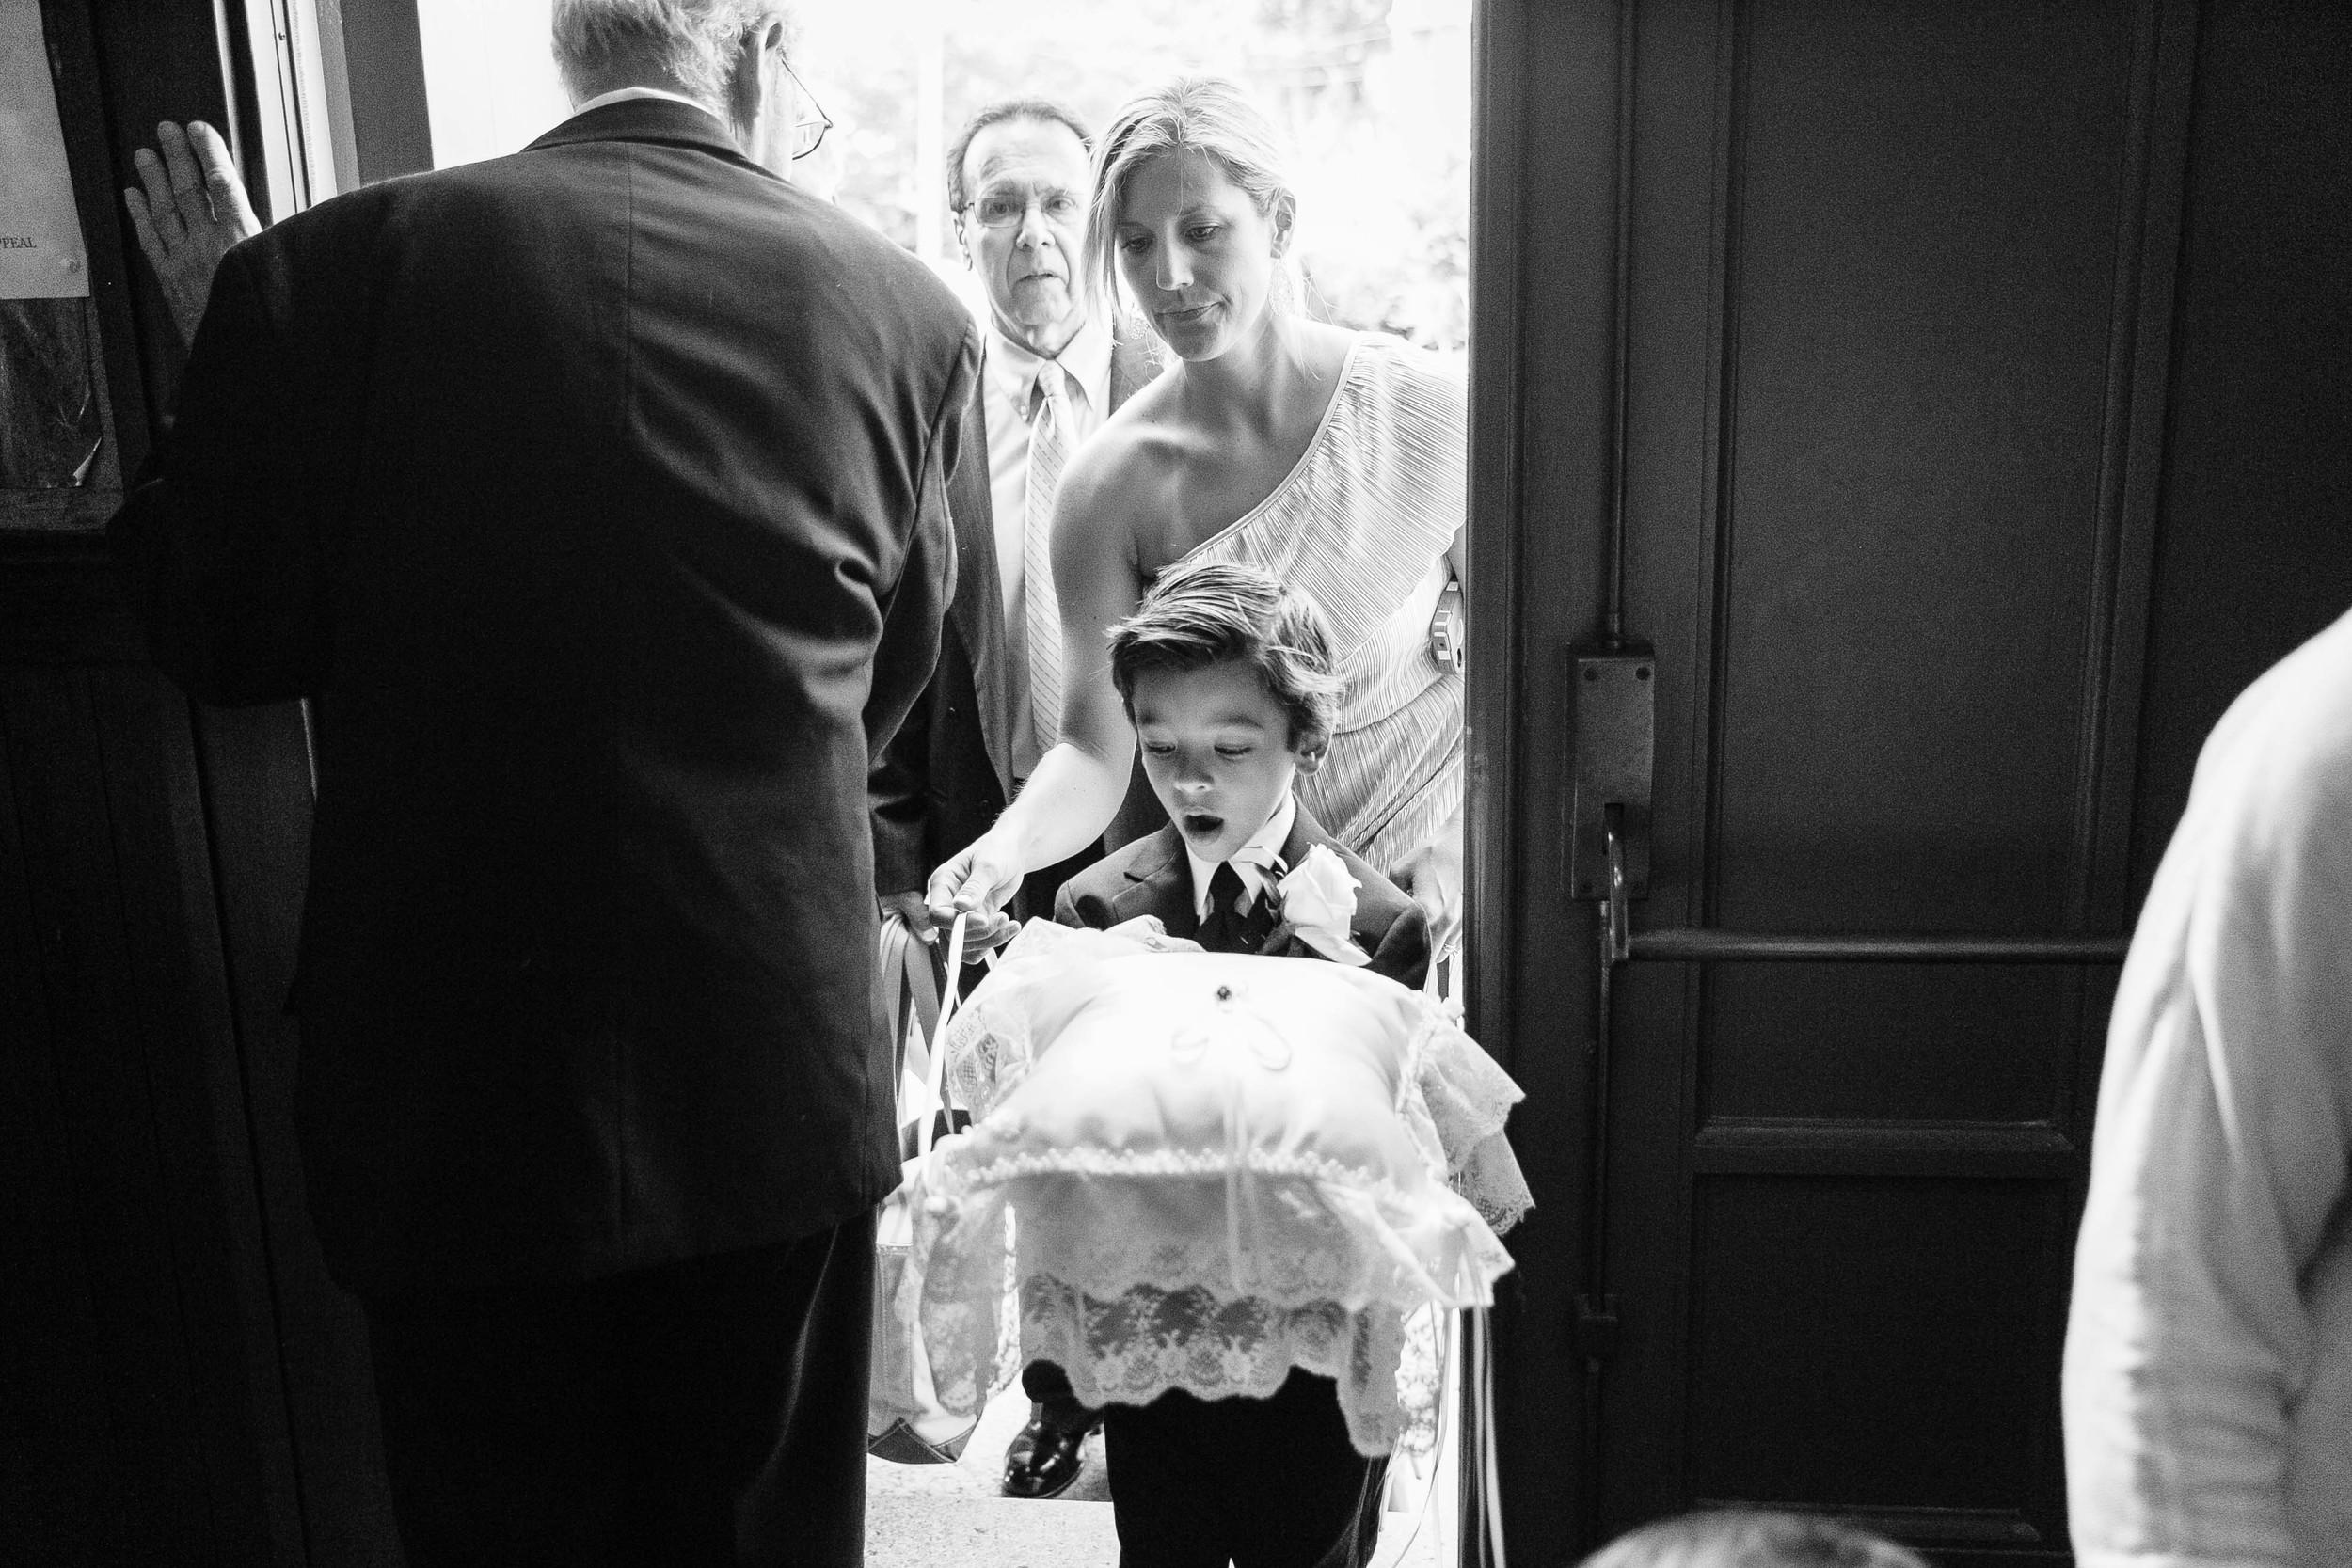 Photo-Journalistic-Wedding-Photography-by-Jacek-Dolata-CT-MA-RI-NJ-NYC-NY-VT-NH-PA-40.jpg